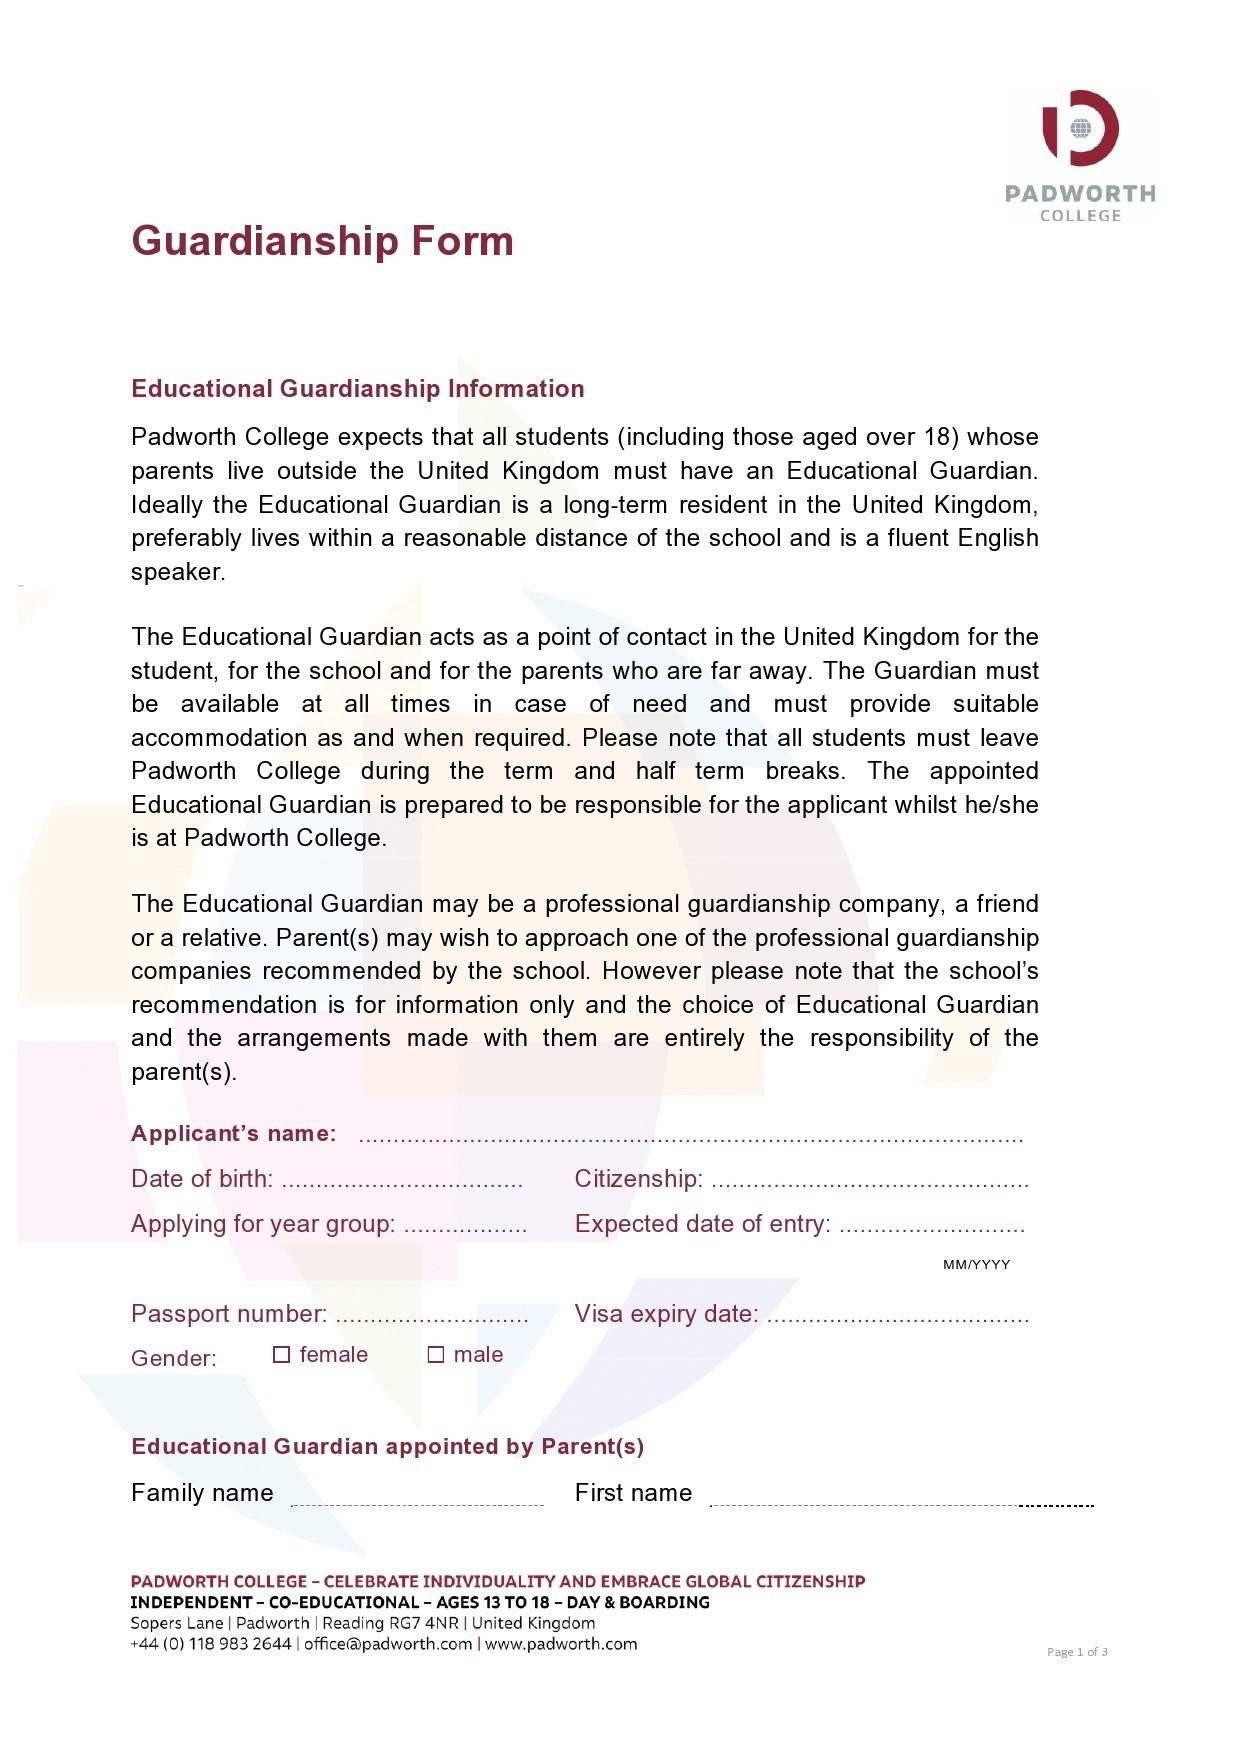 Free guardianship form 37